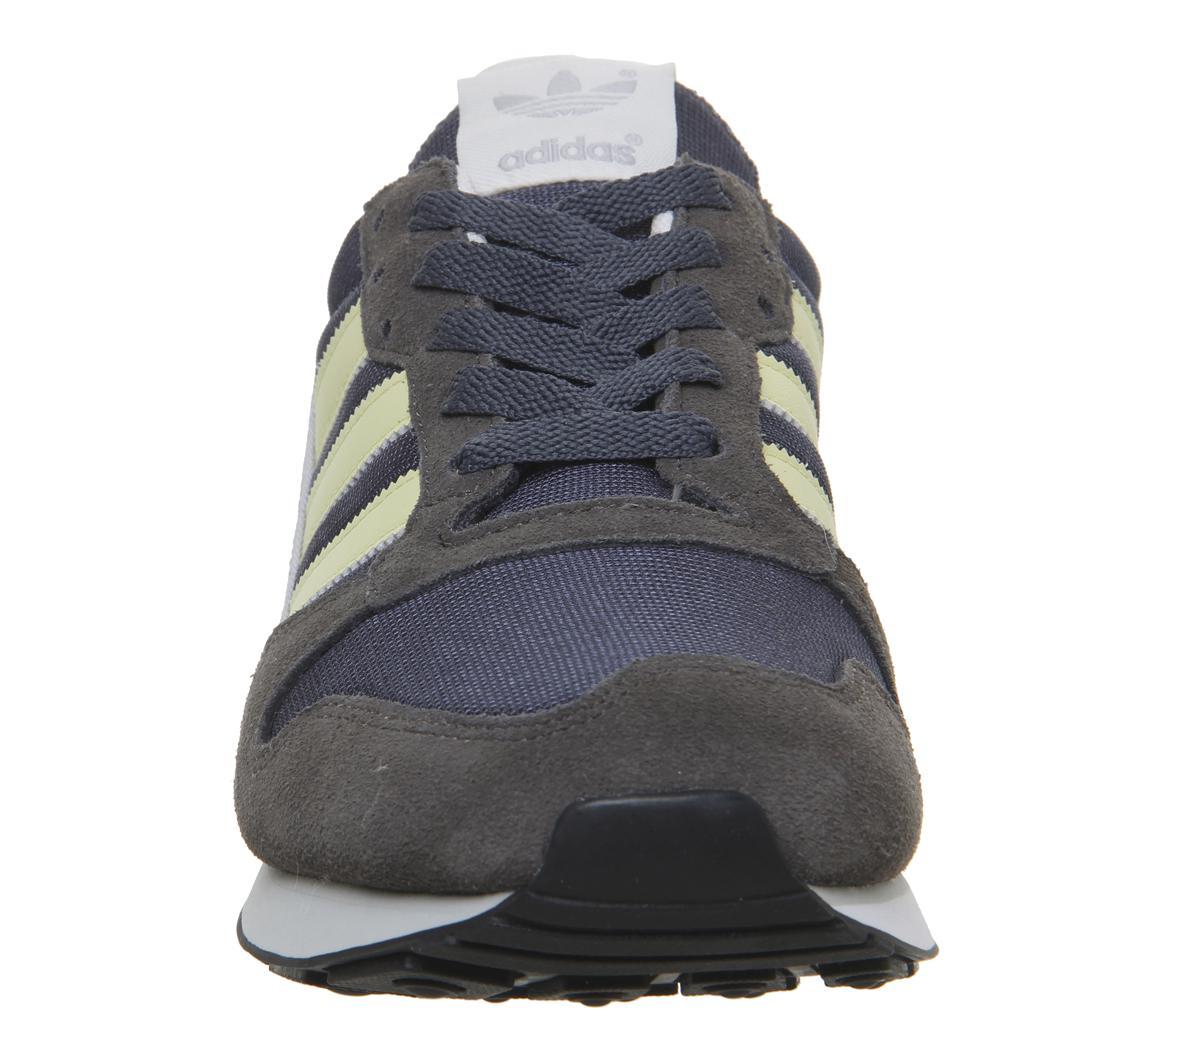 e5235ea760fa Adidas - Gray Zx280 Spezial Trainers for Men - Lyst. View fullscreen